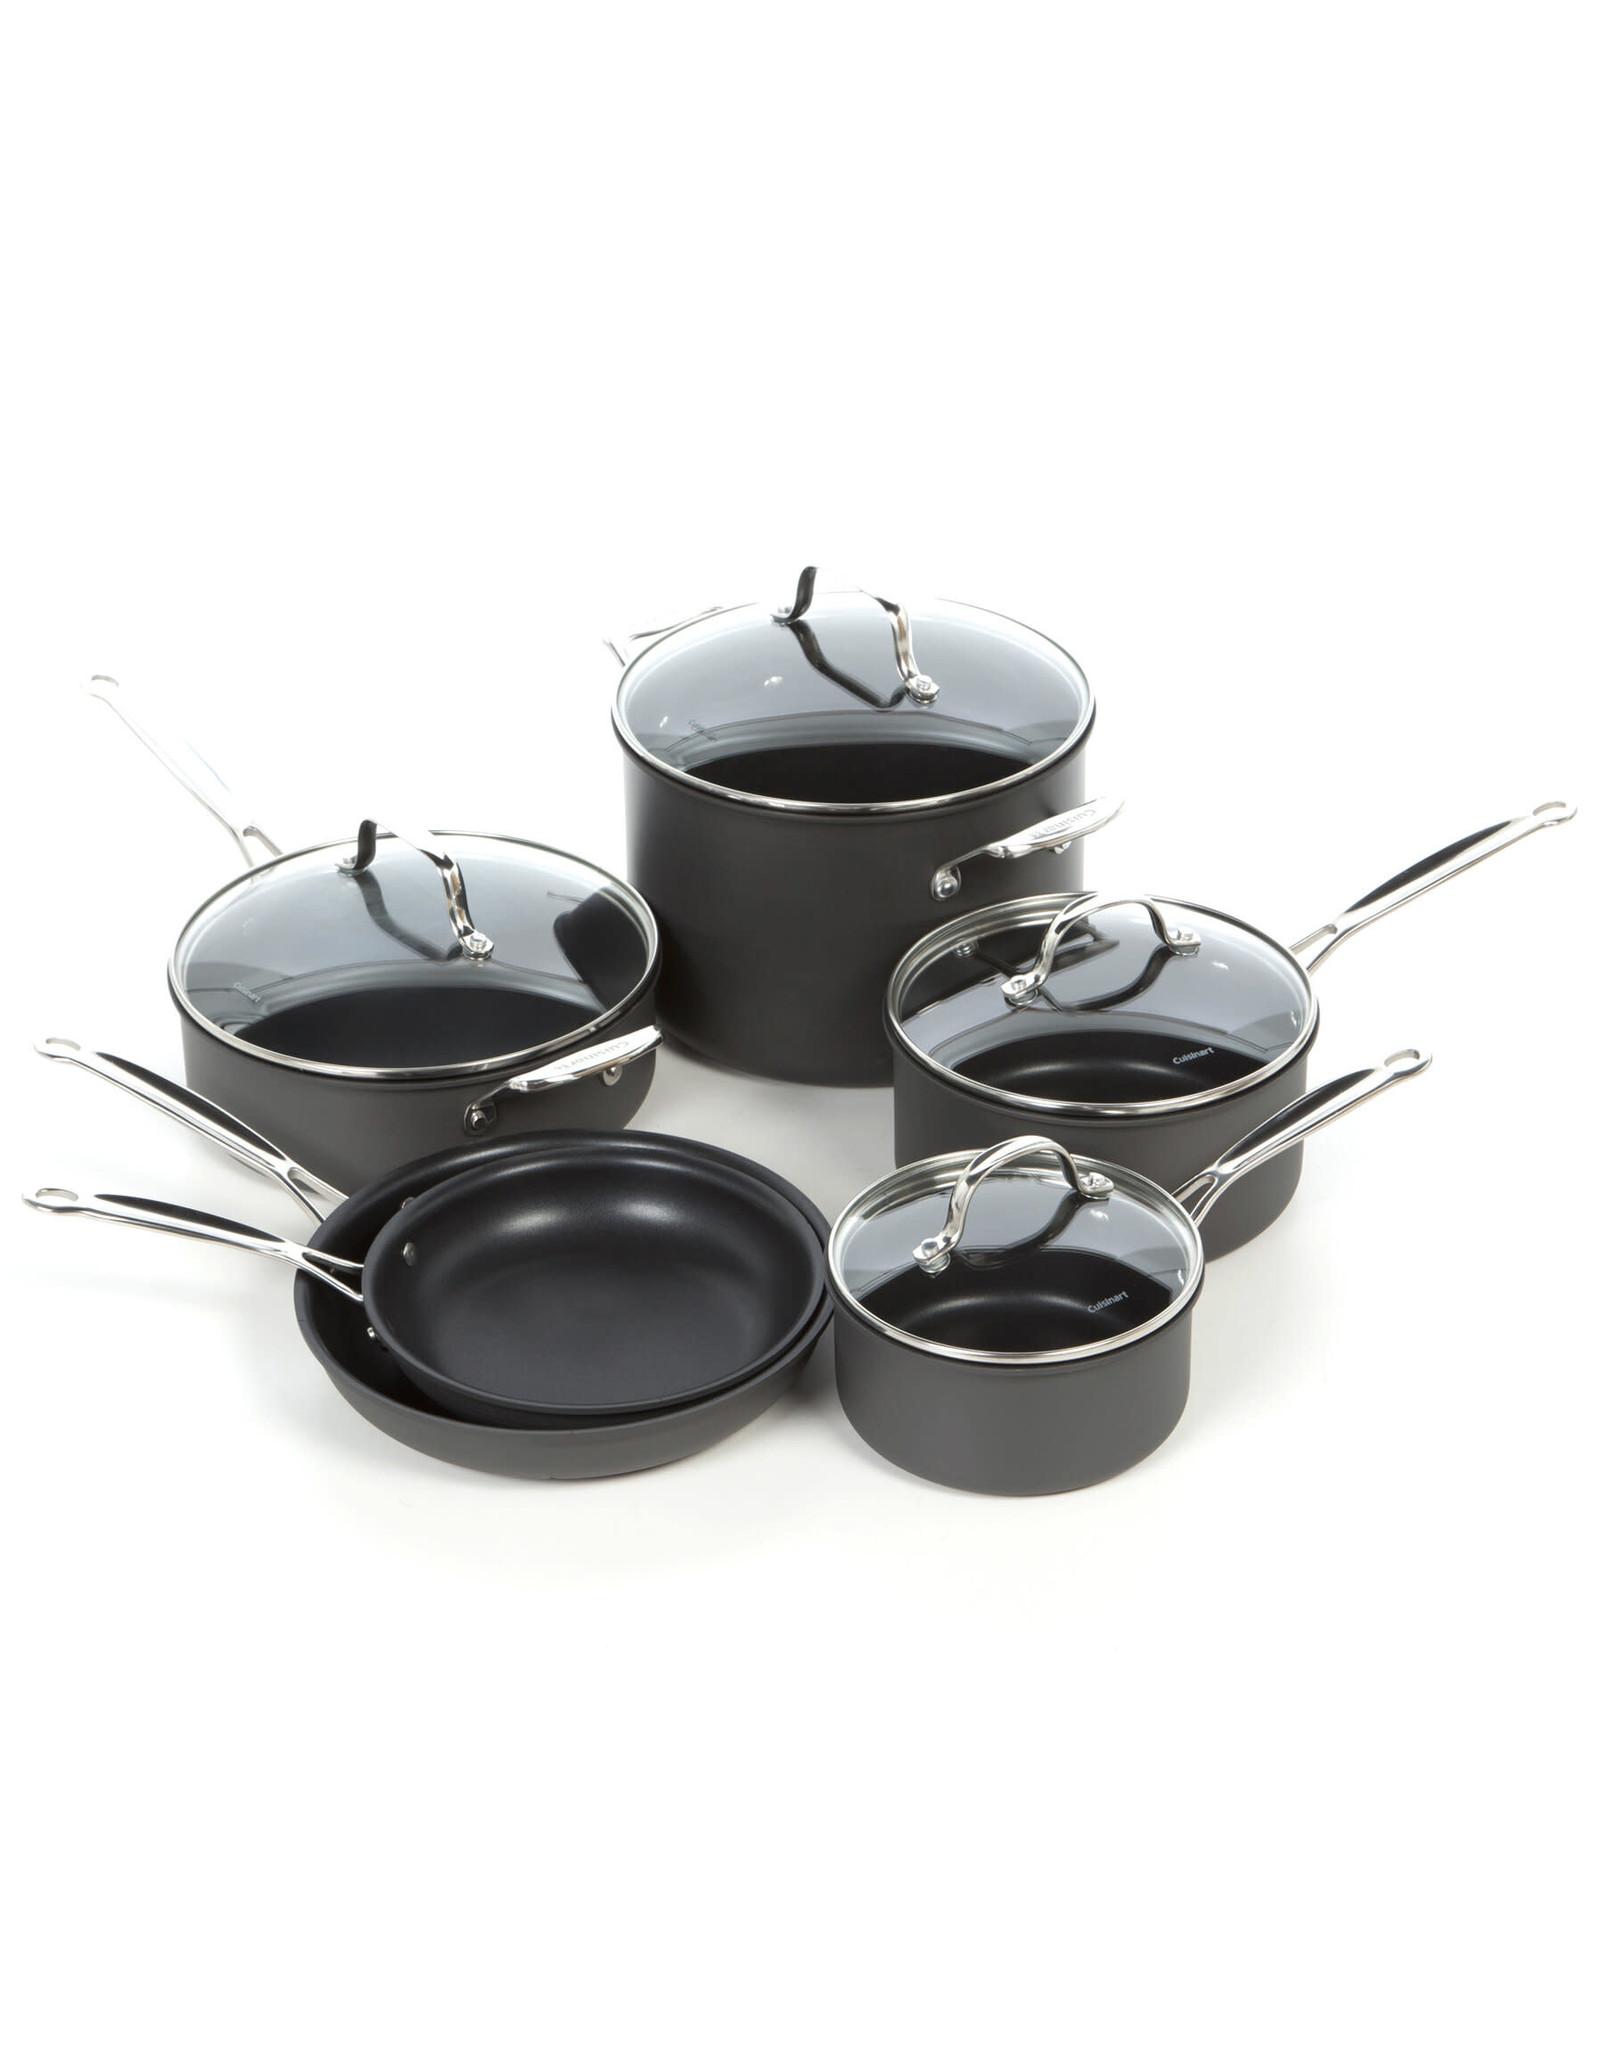 Cuisinart Chef Non-Stick Hard Anodized 10 Piece Pot Set